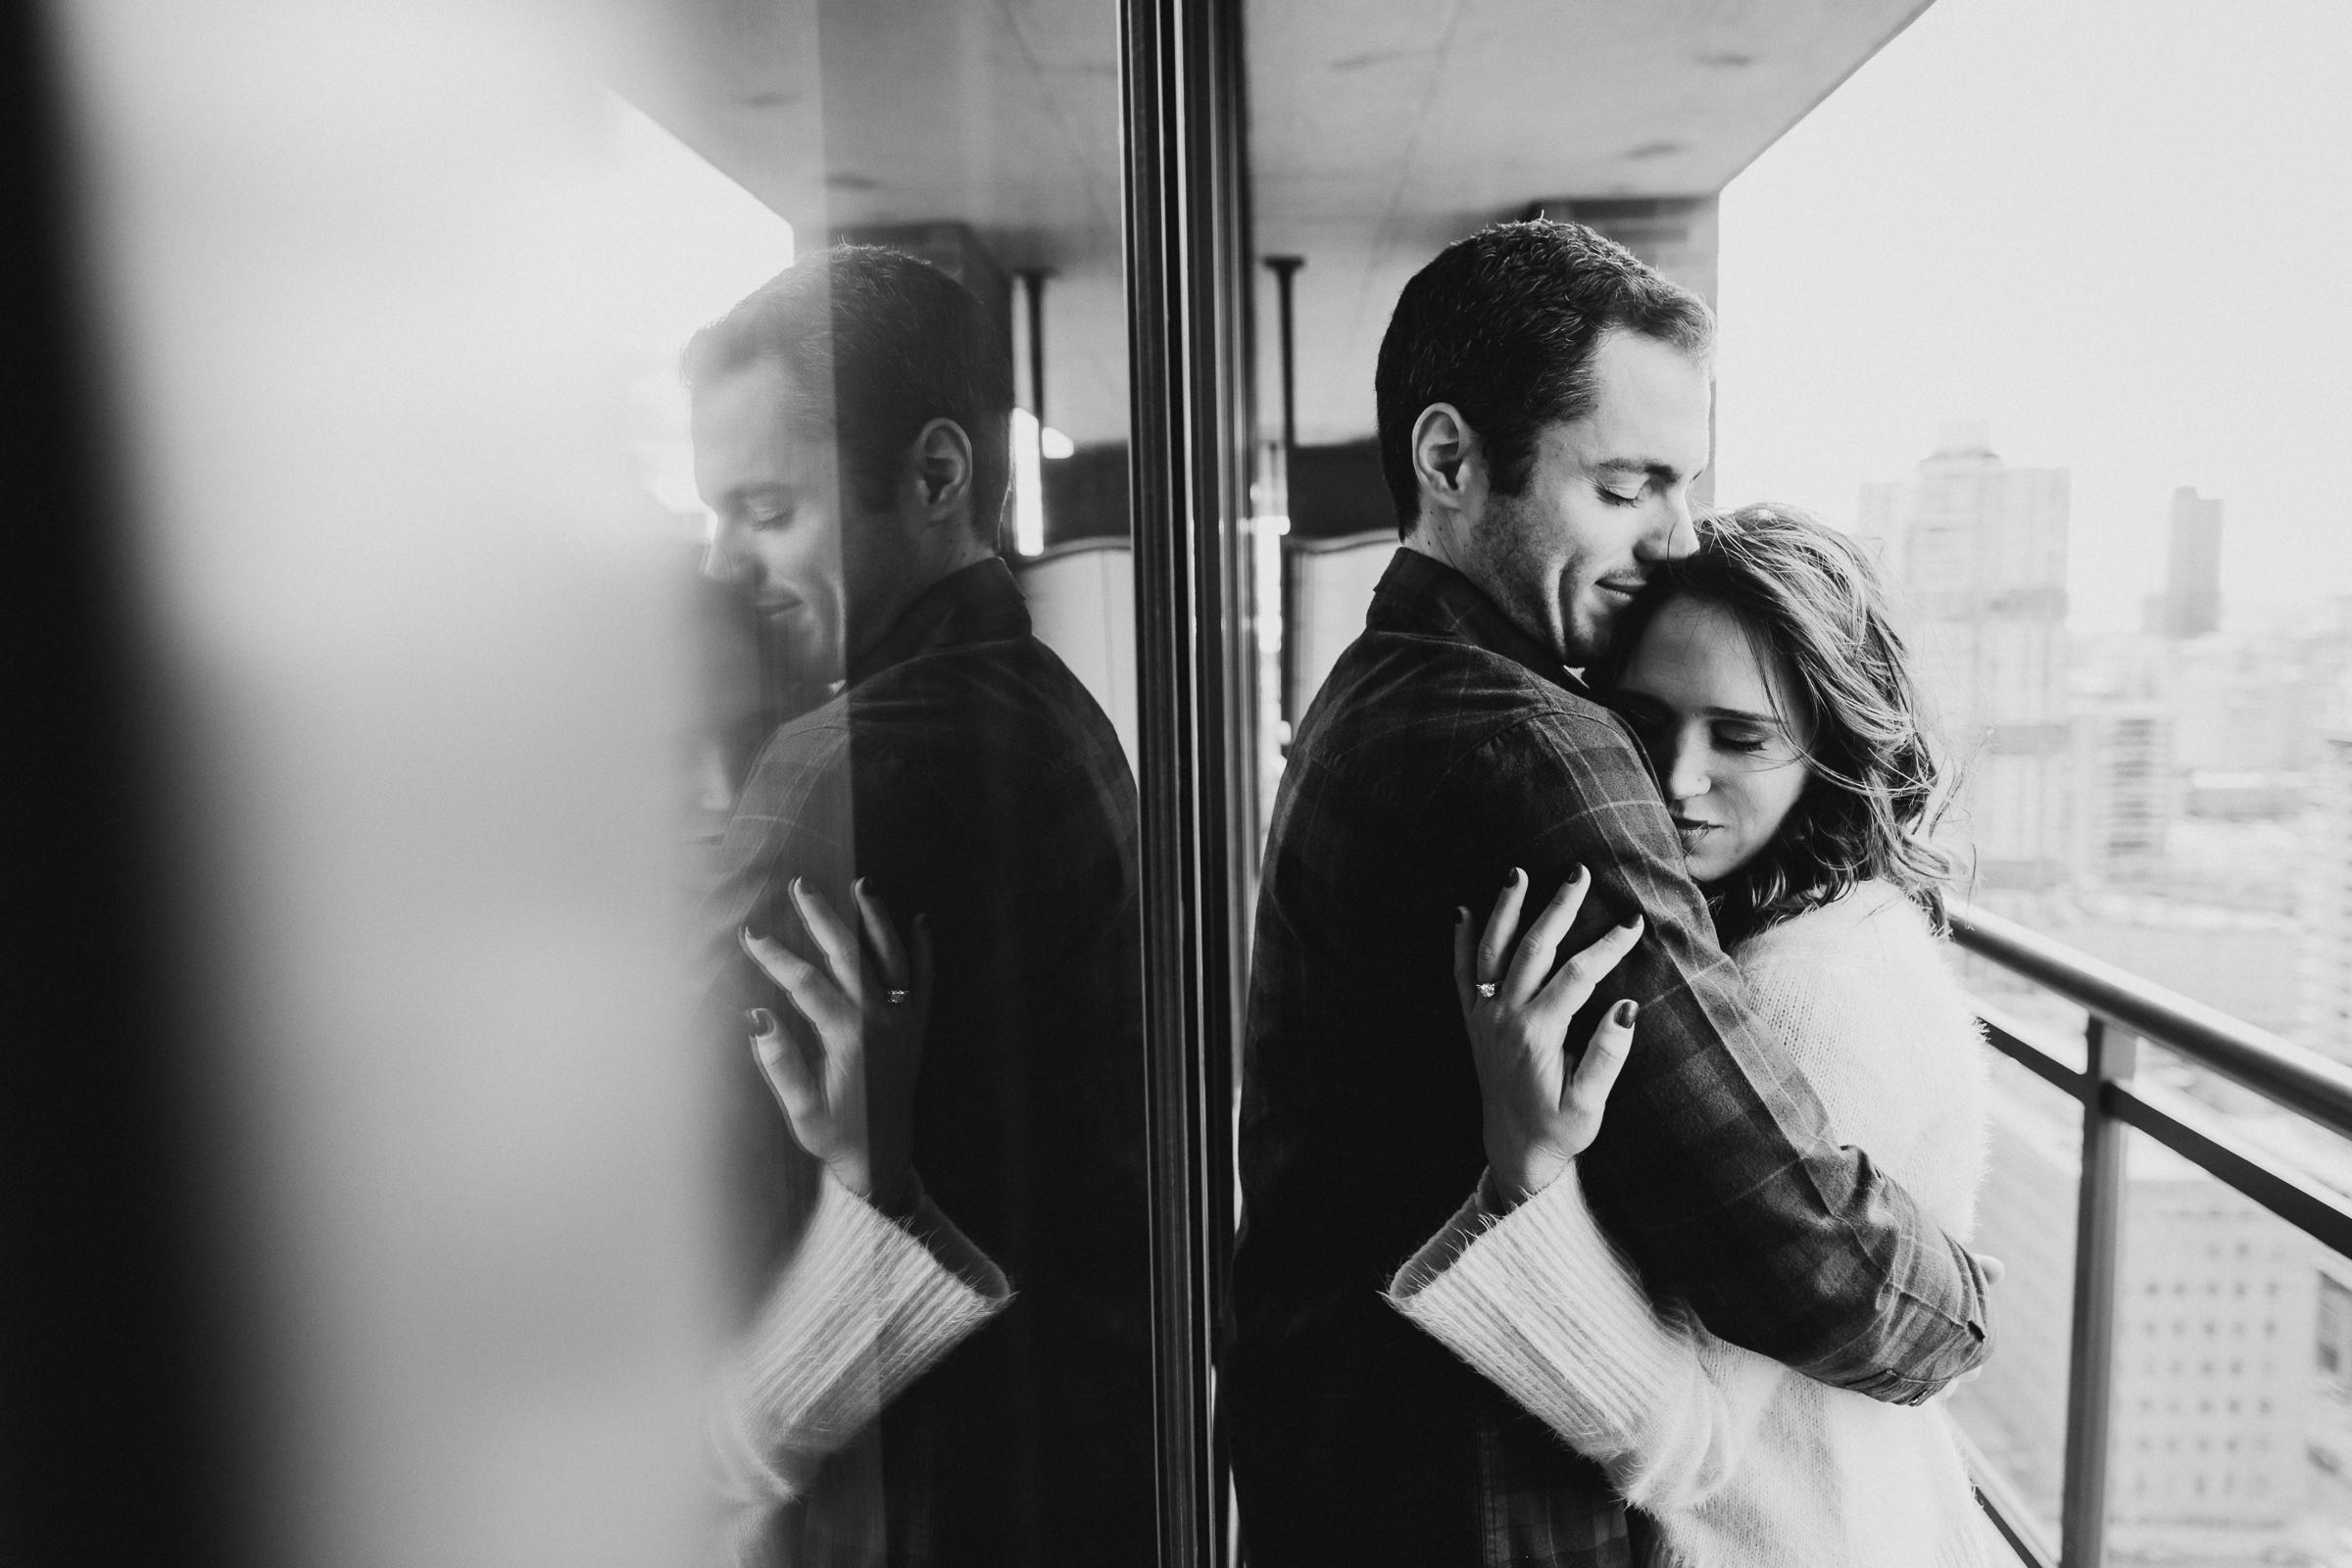 Jersey-City-Engagement-Photos-Documentary-Wedding-Photographer-NYC-24.jpg